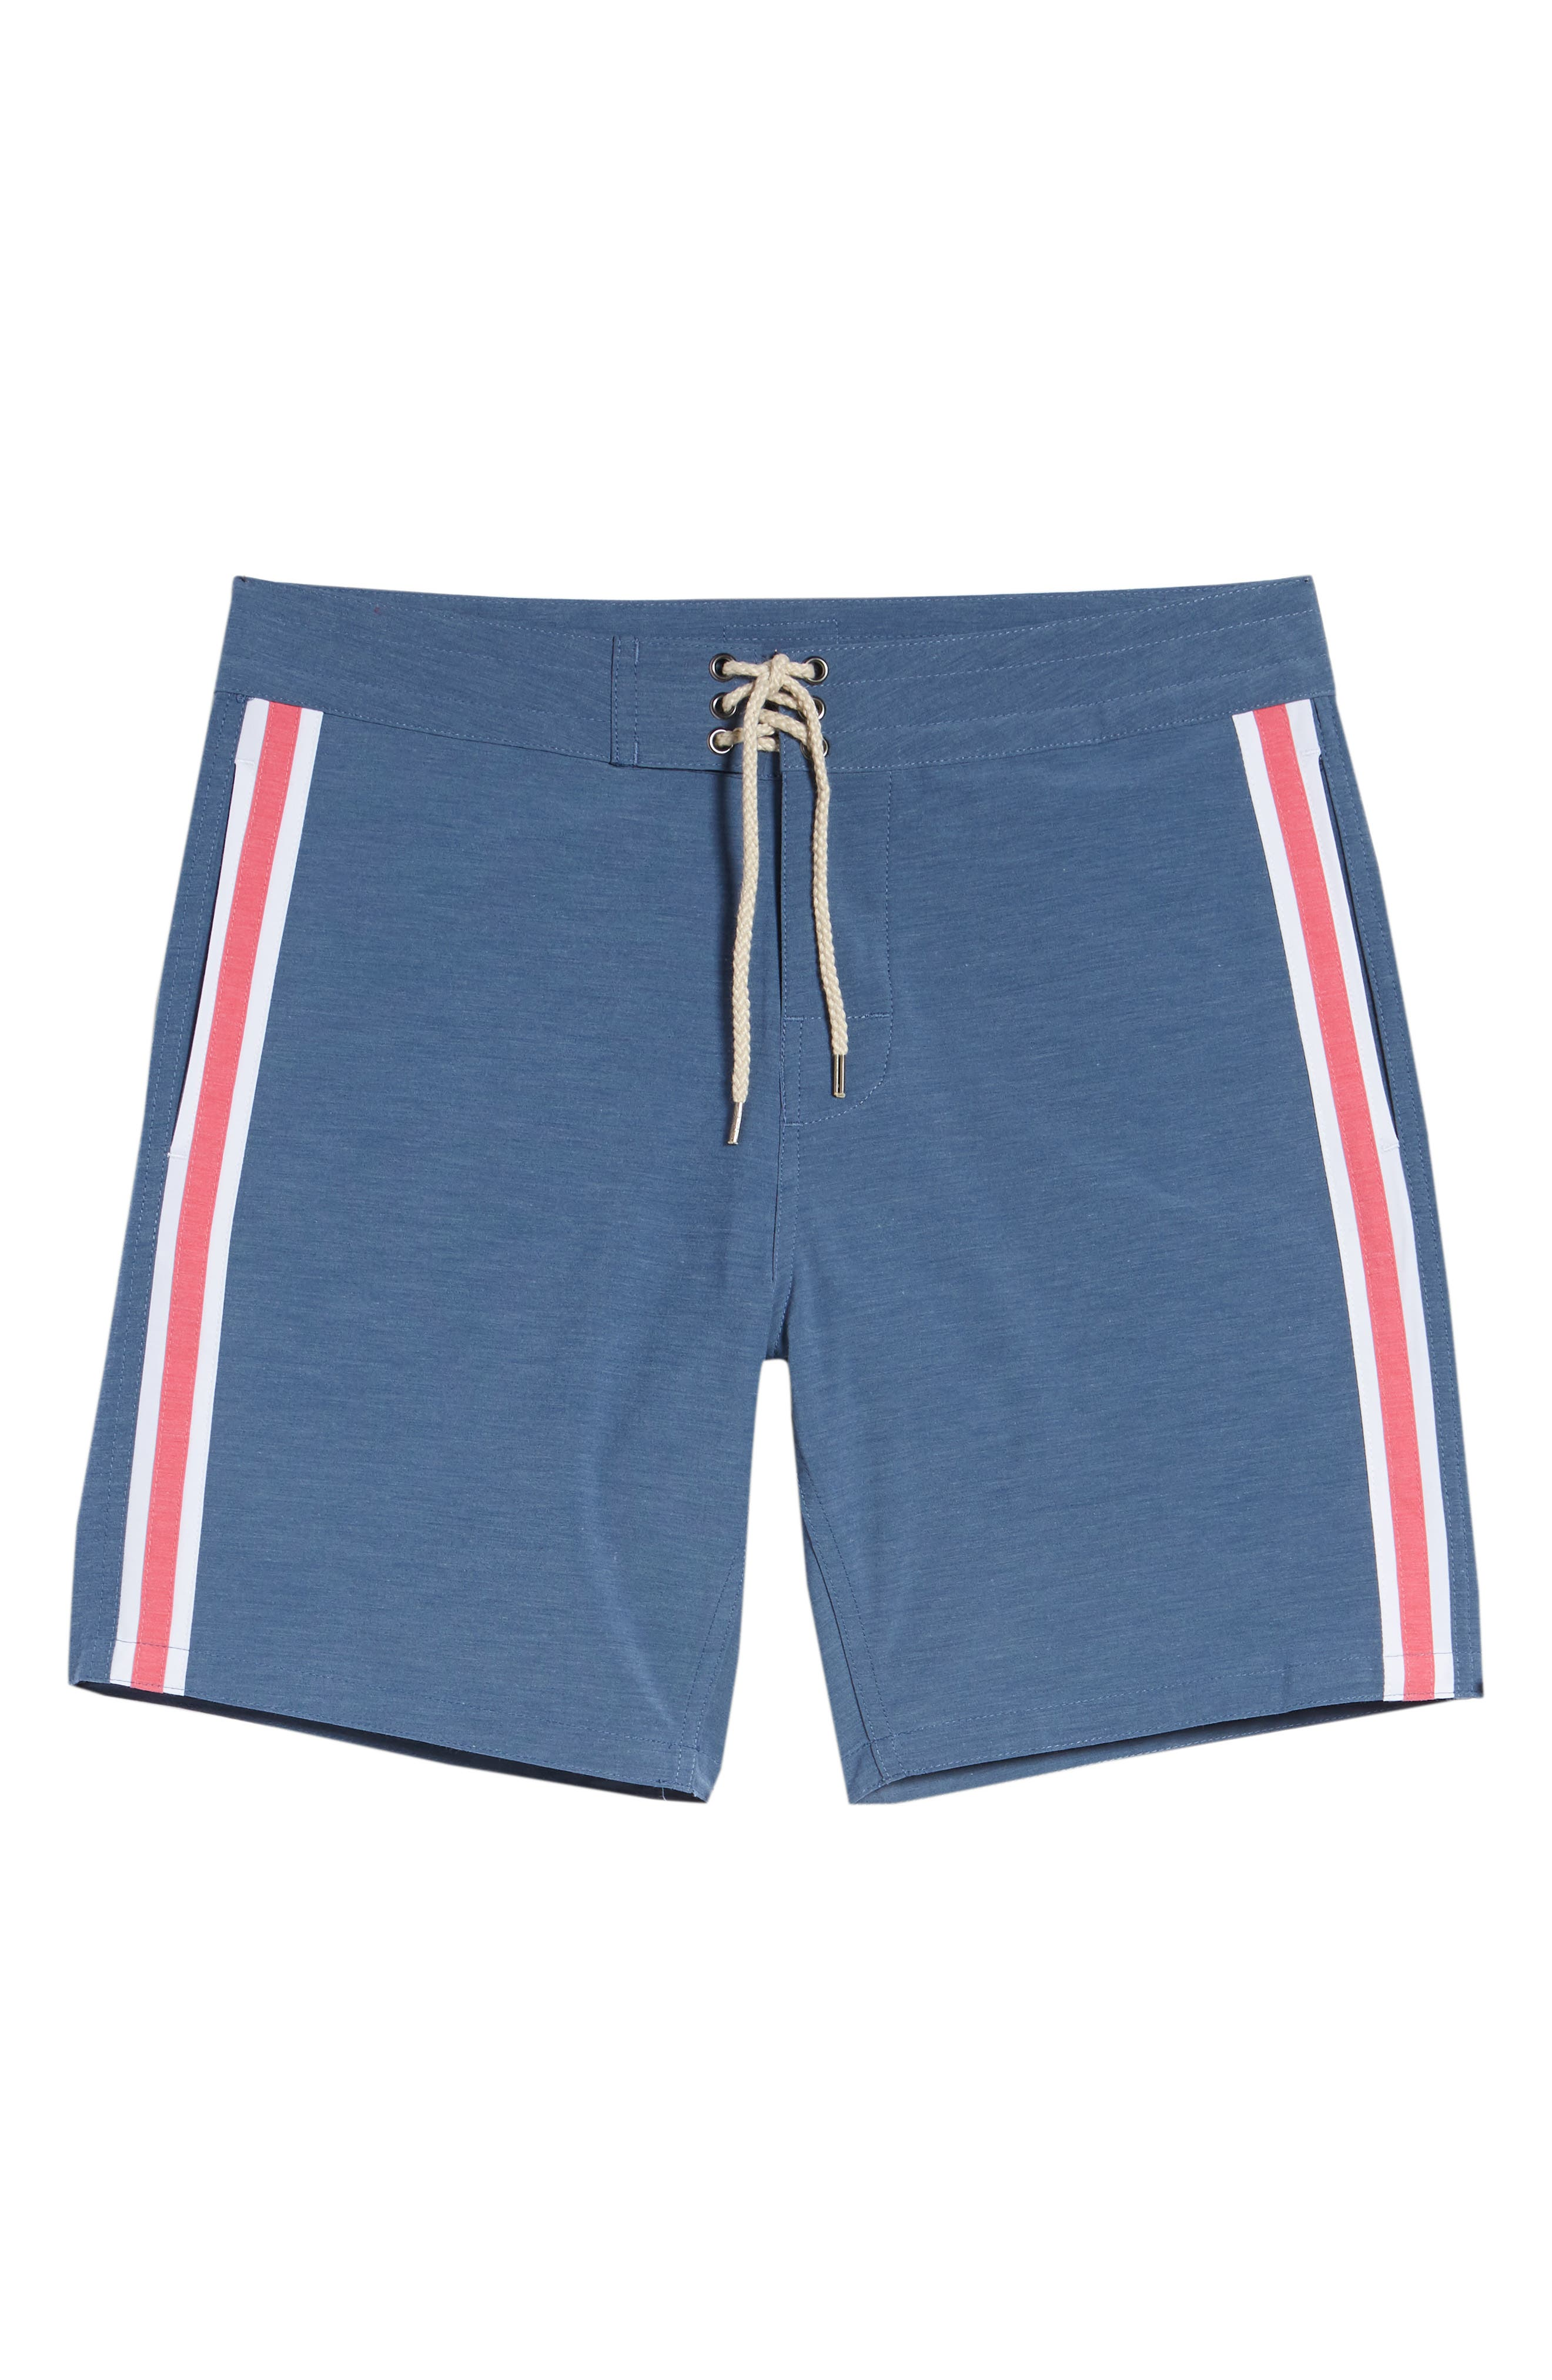 Retro Surf Stripe Board Shorts,                             Alternate thumbnail 6, color,                             Blue Red White